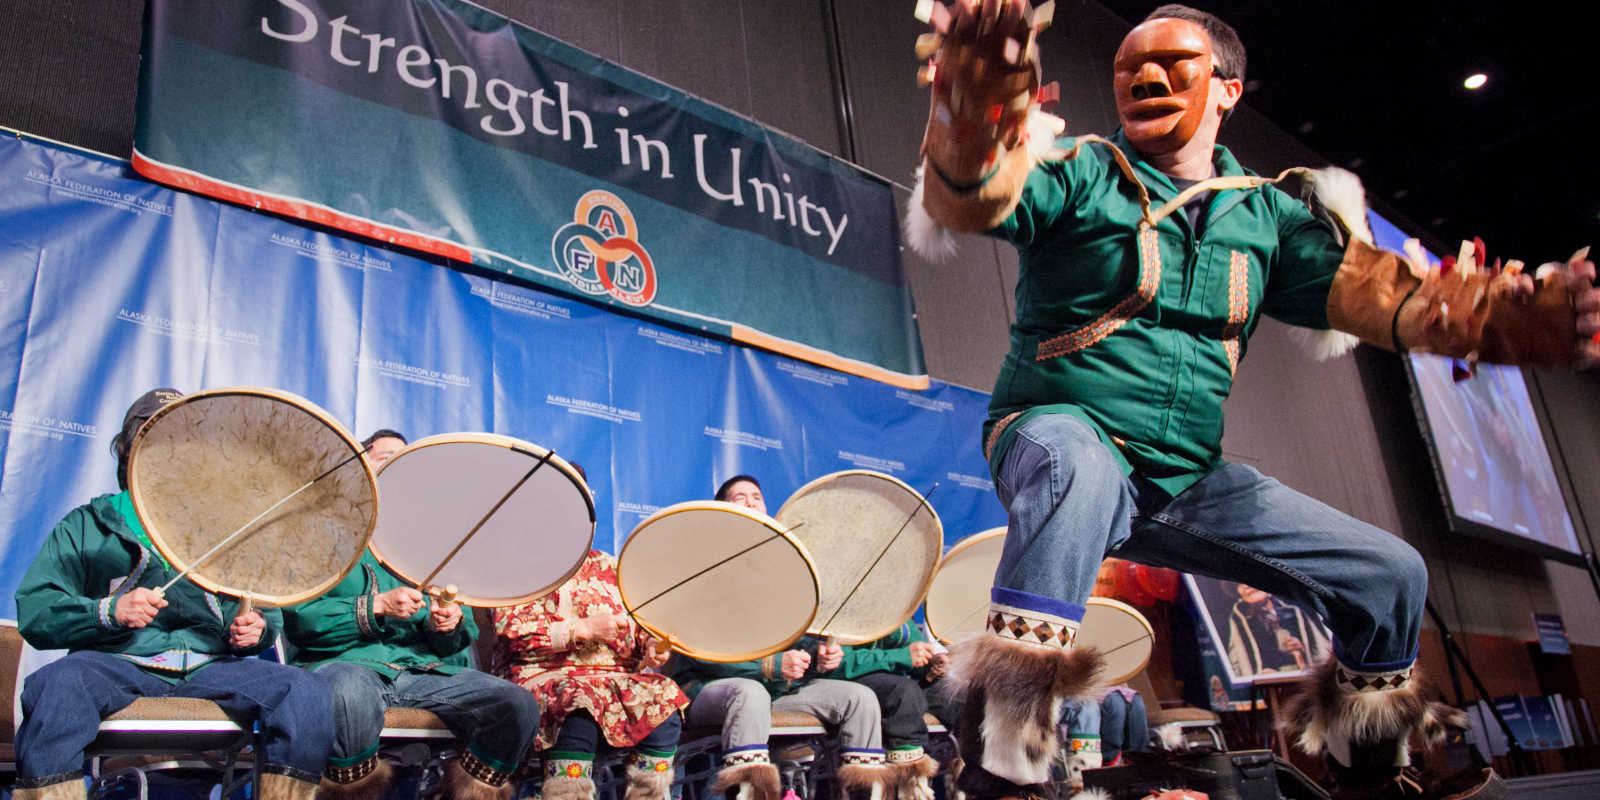 Alaska Native dancing and drumming at AFN convention